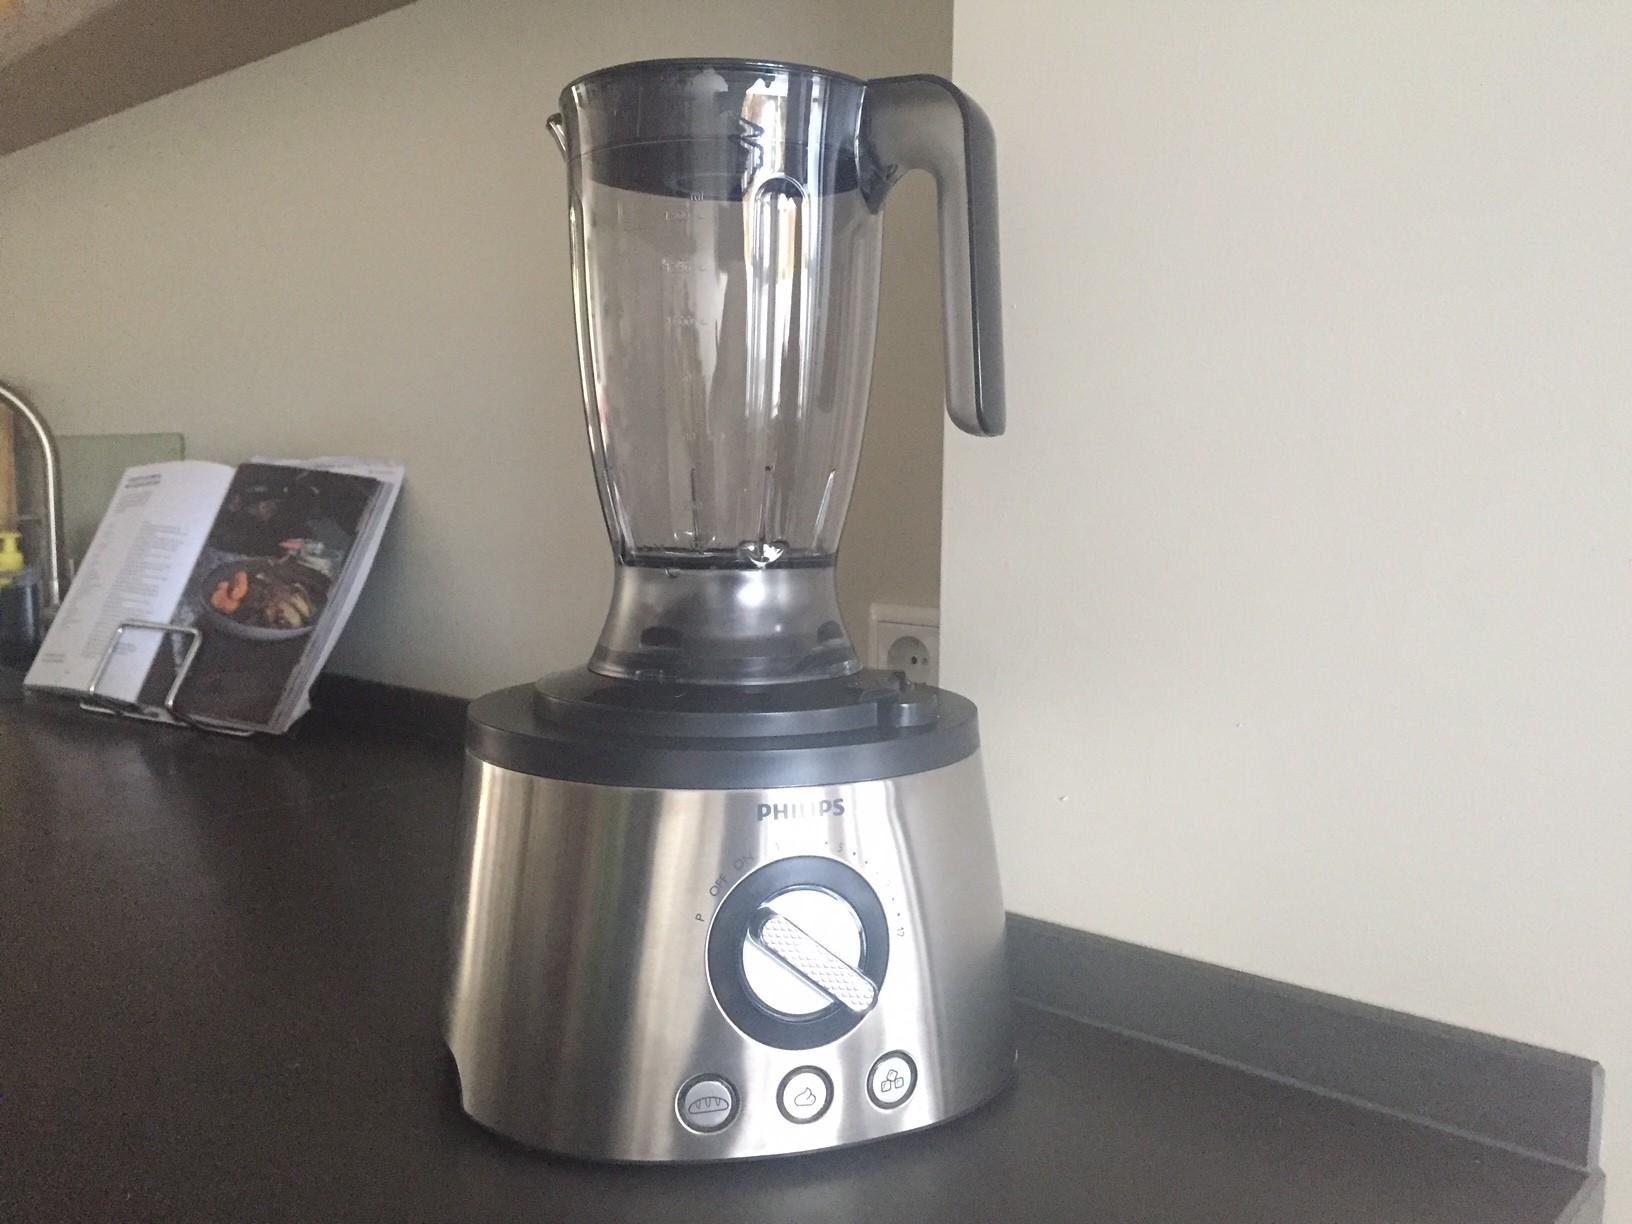 Nieuwe keukenmachine unboxed Foodblog Foodinista